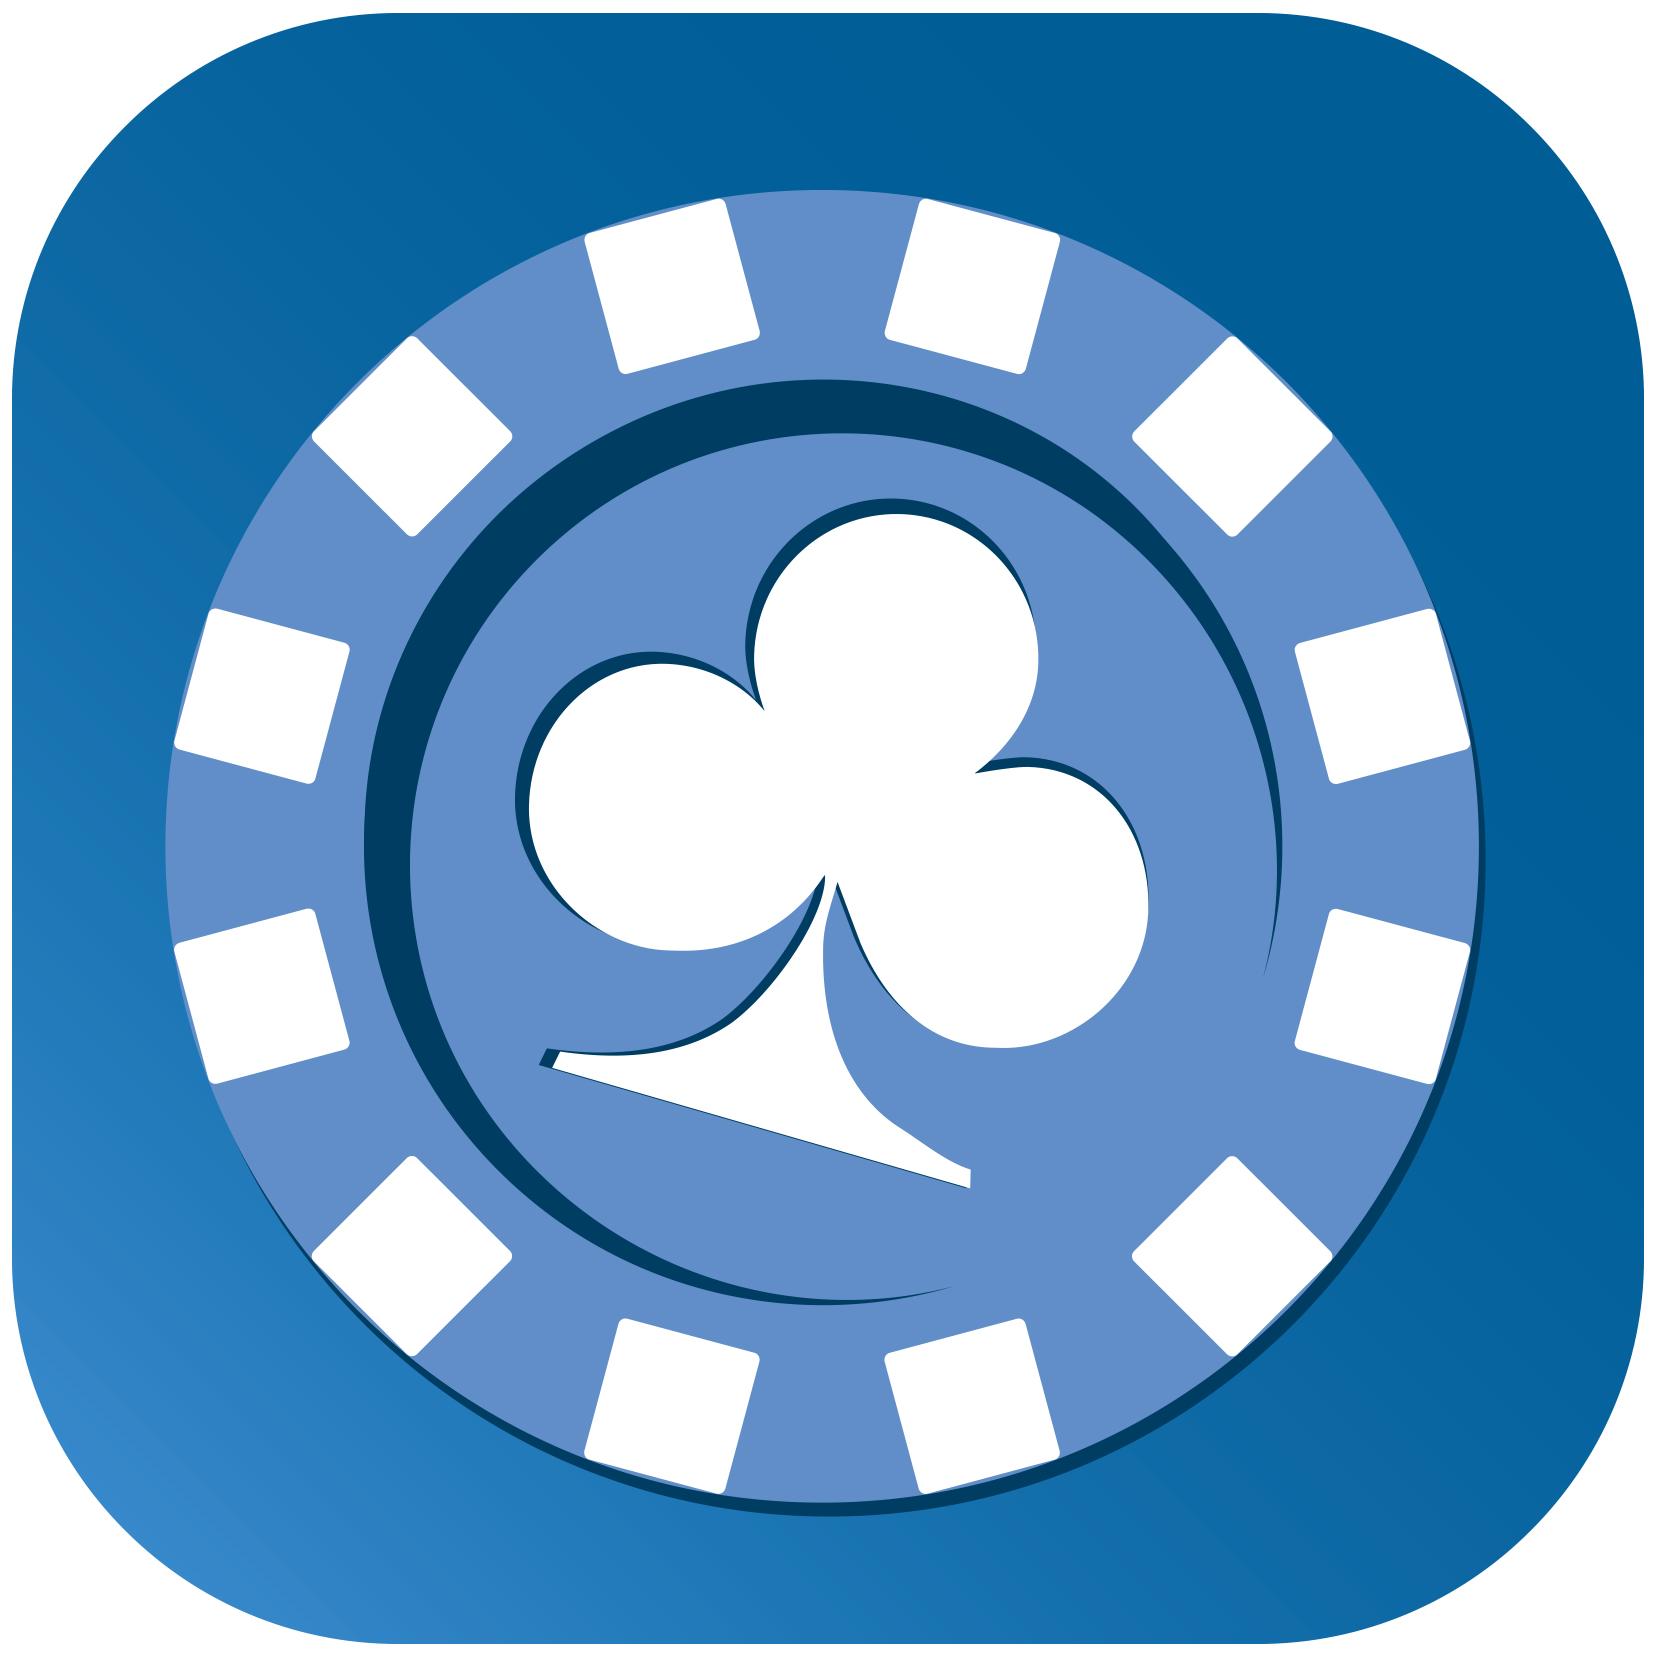 Gambling affiliation the aruban resort & casino oranjestad